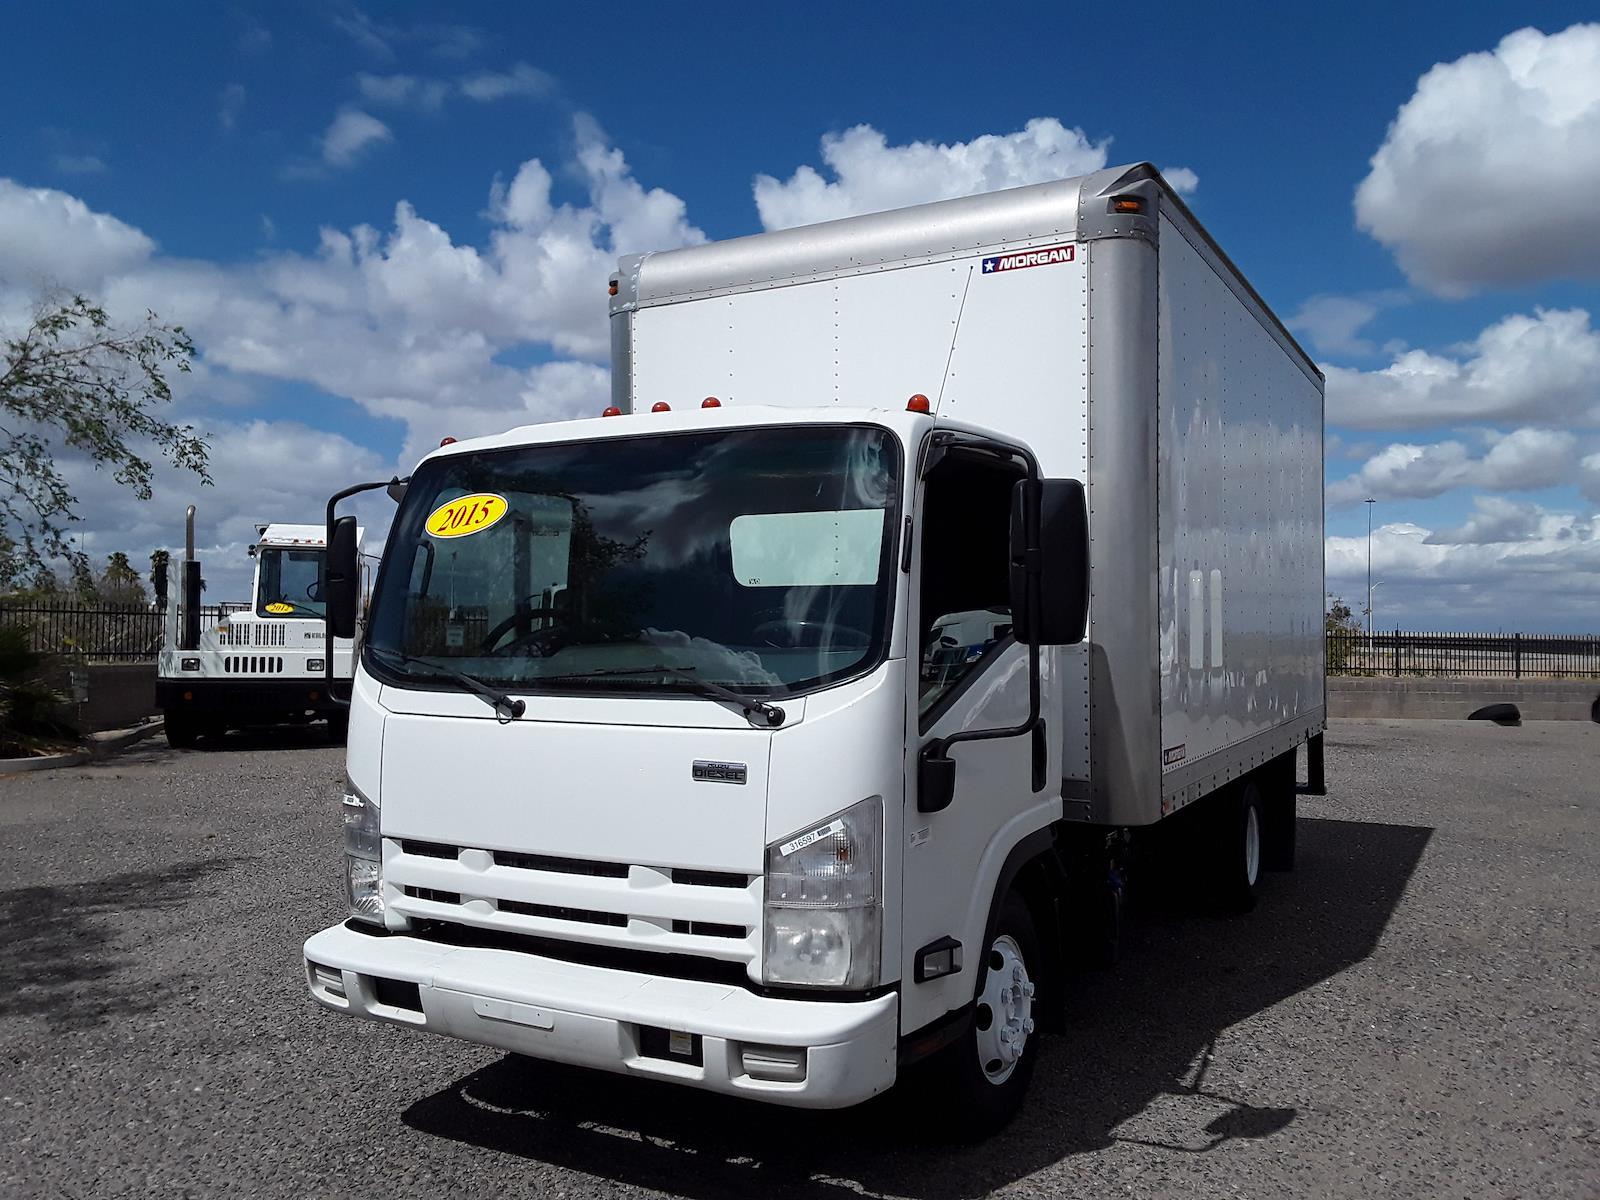 2015 Isuzu NPR-HD Regular Cab 4x2, Dry Freight #316597 - photo 1